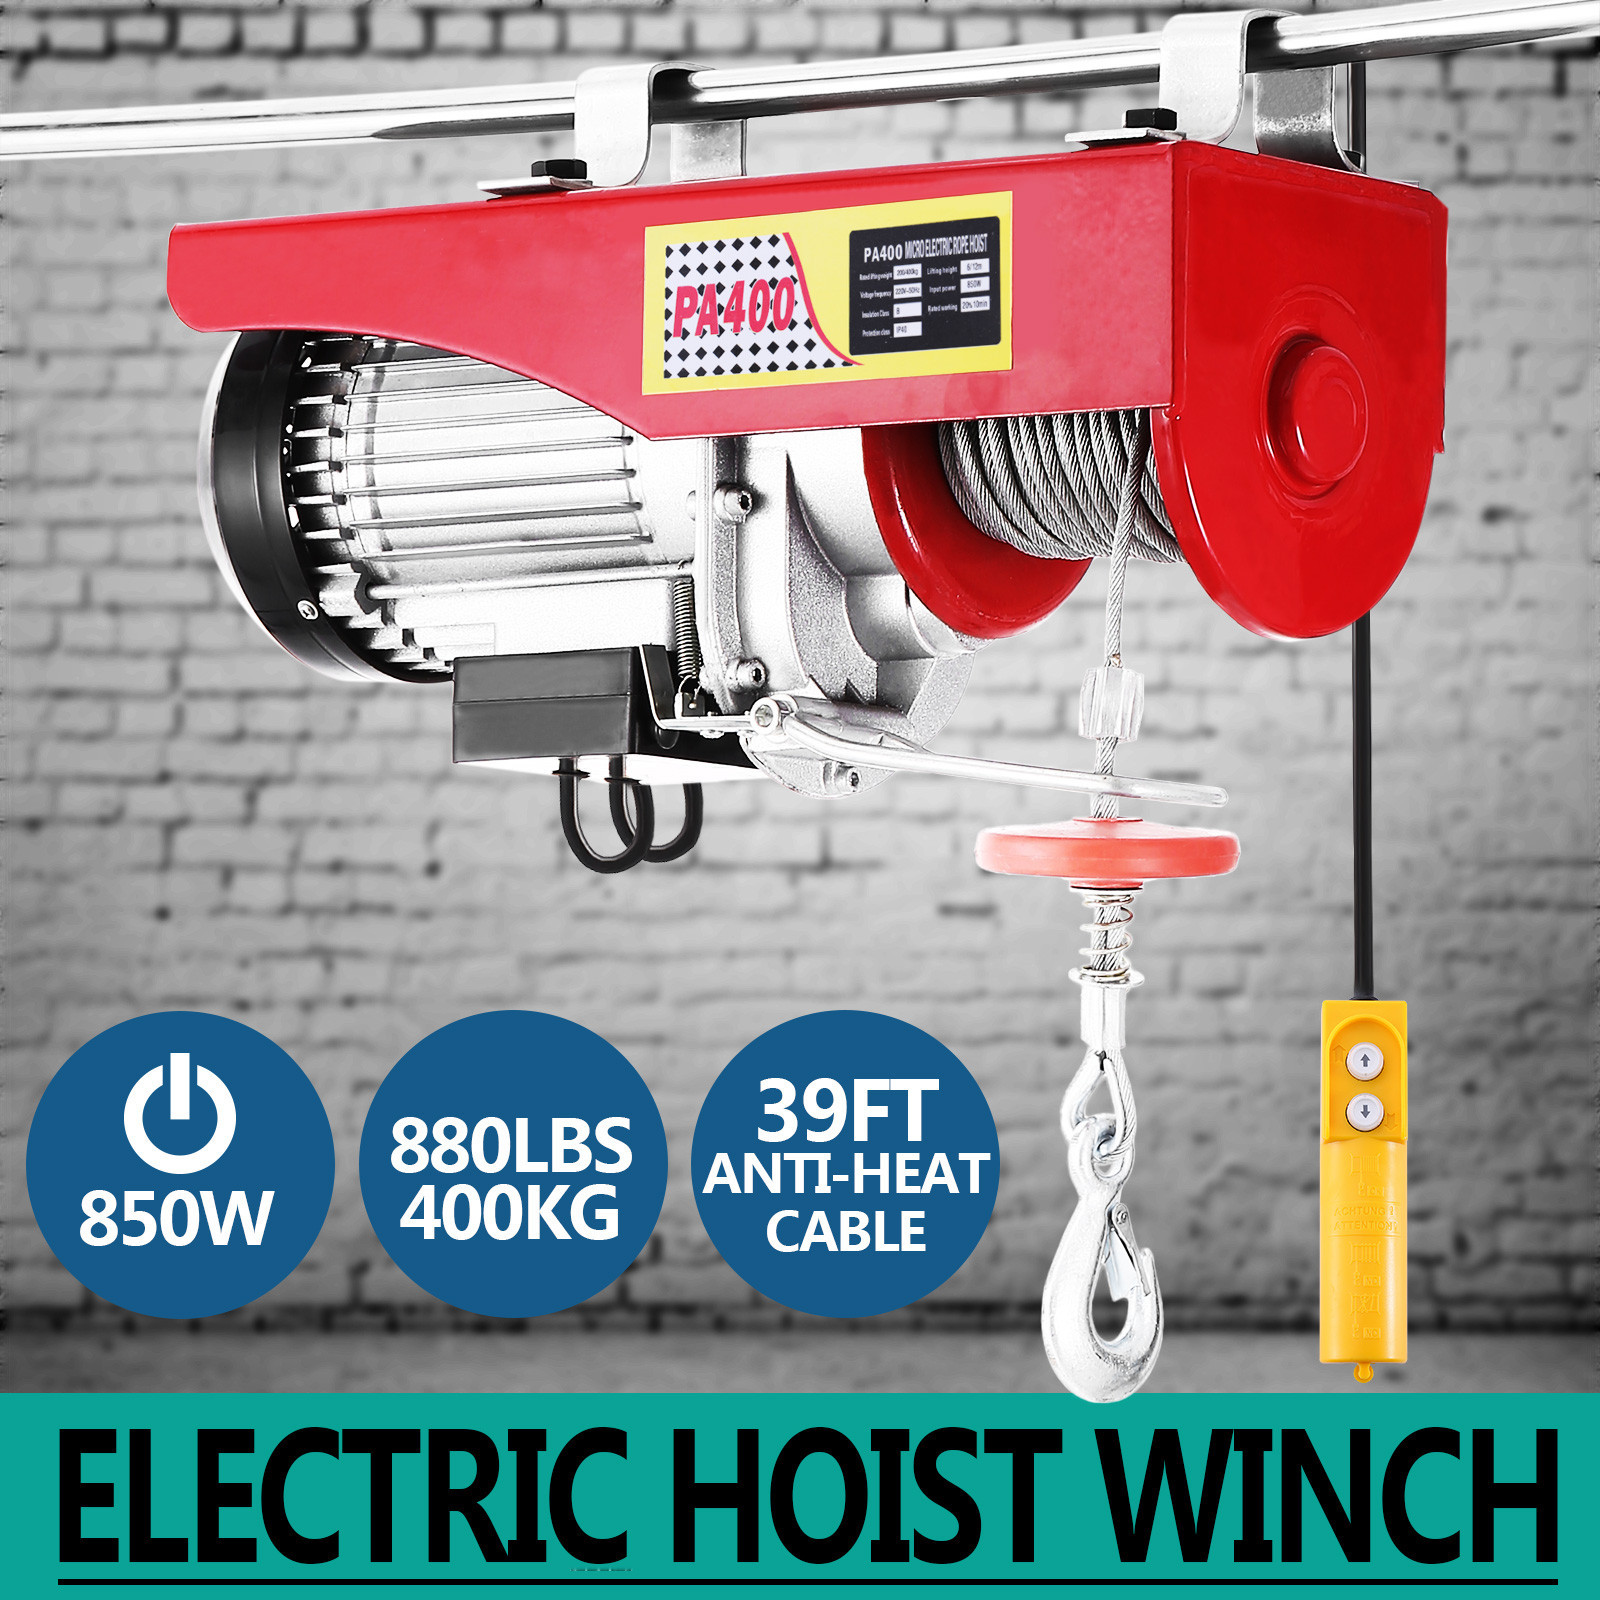 100kg-900kg-Electric-Hoist-Winch-Lifting-Engine-Crane-Cable-Lift-Hook-Garage miniature 25